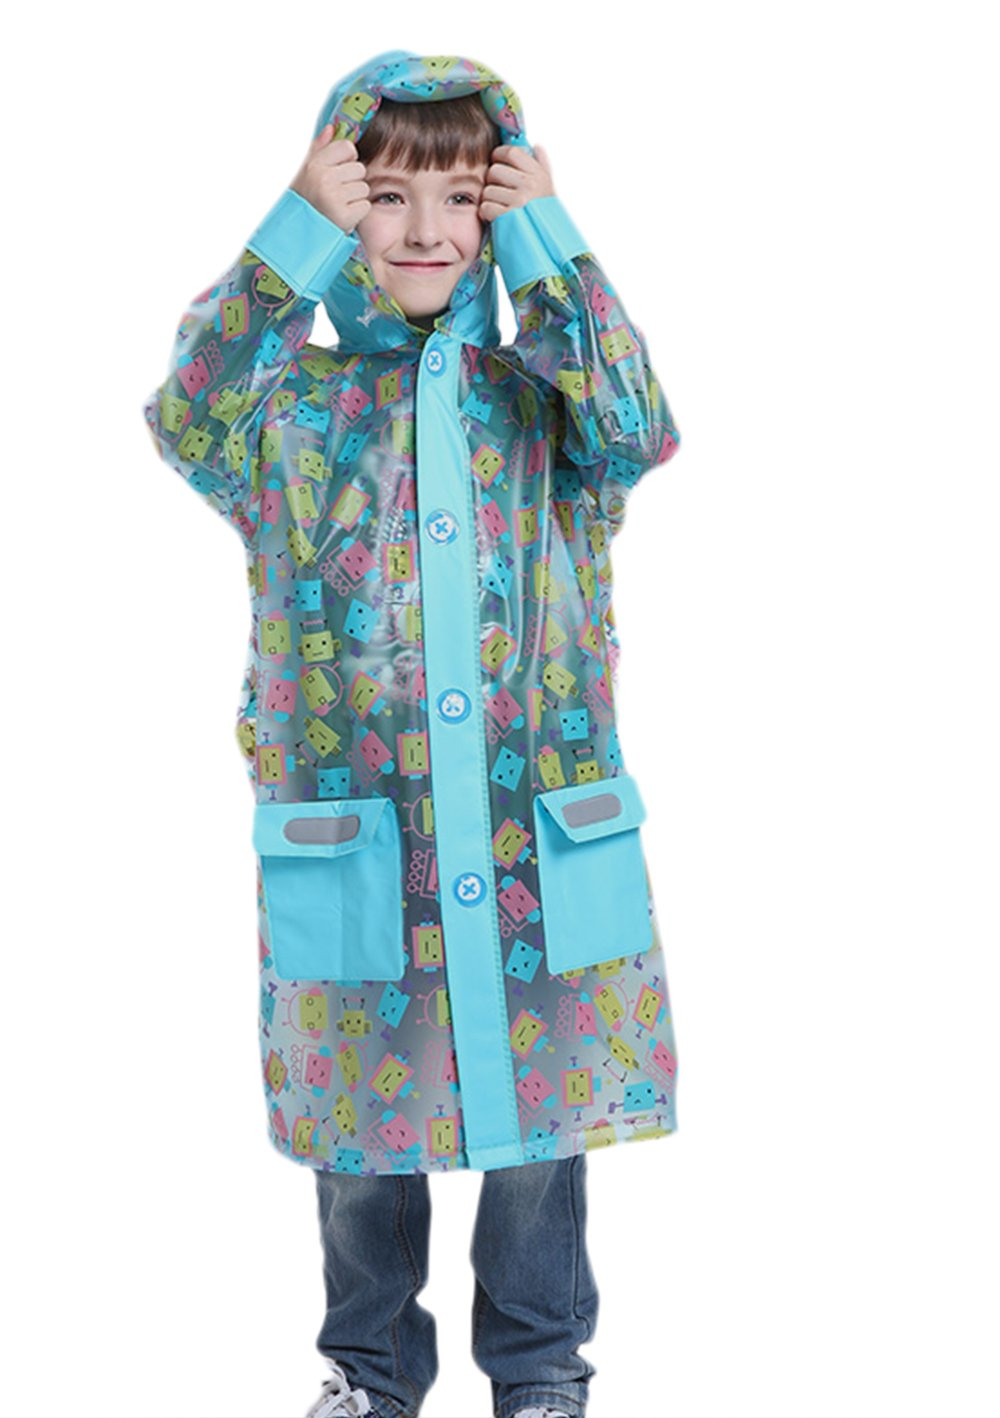 LINENLUX Kids Raincoat Jacket Waterproof Rainwear with Backpack Cover